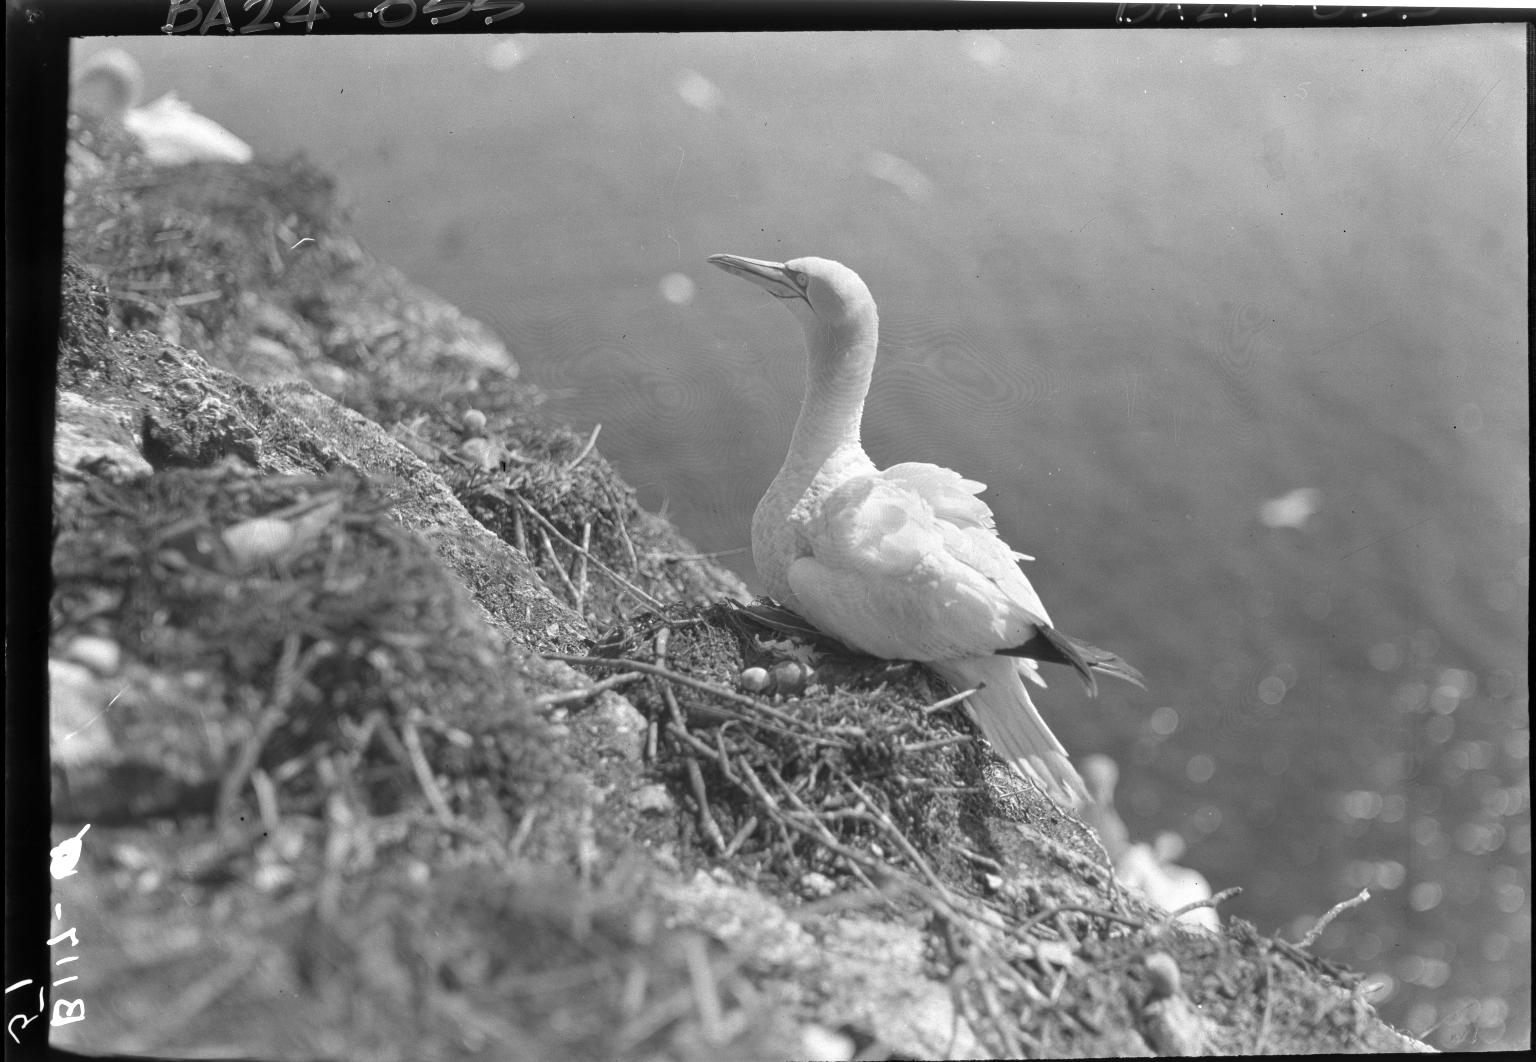 Fieldwork on Bonaventure Island